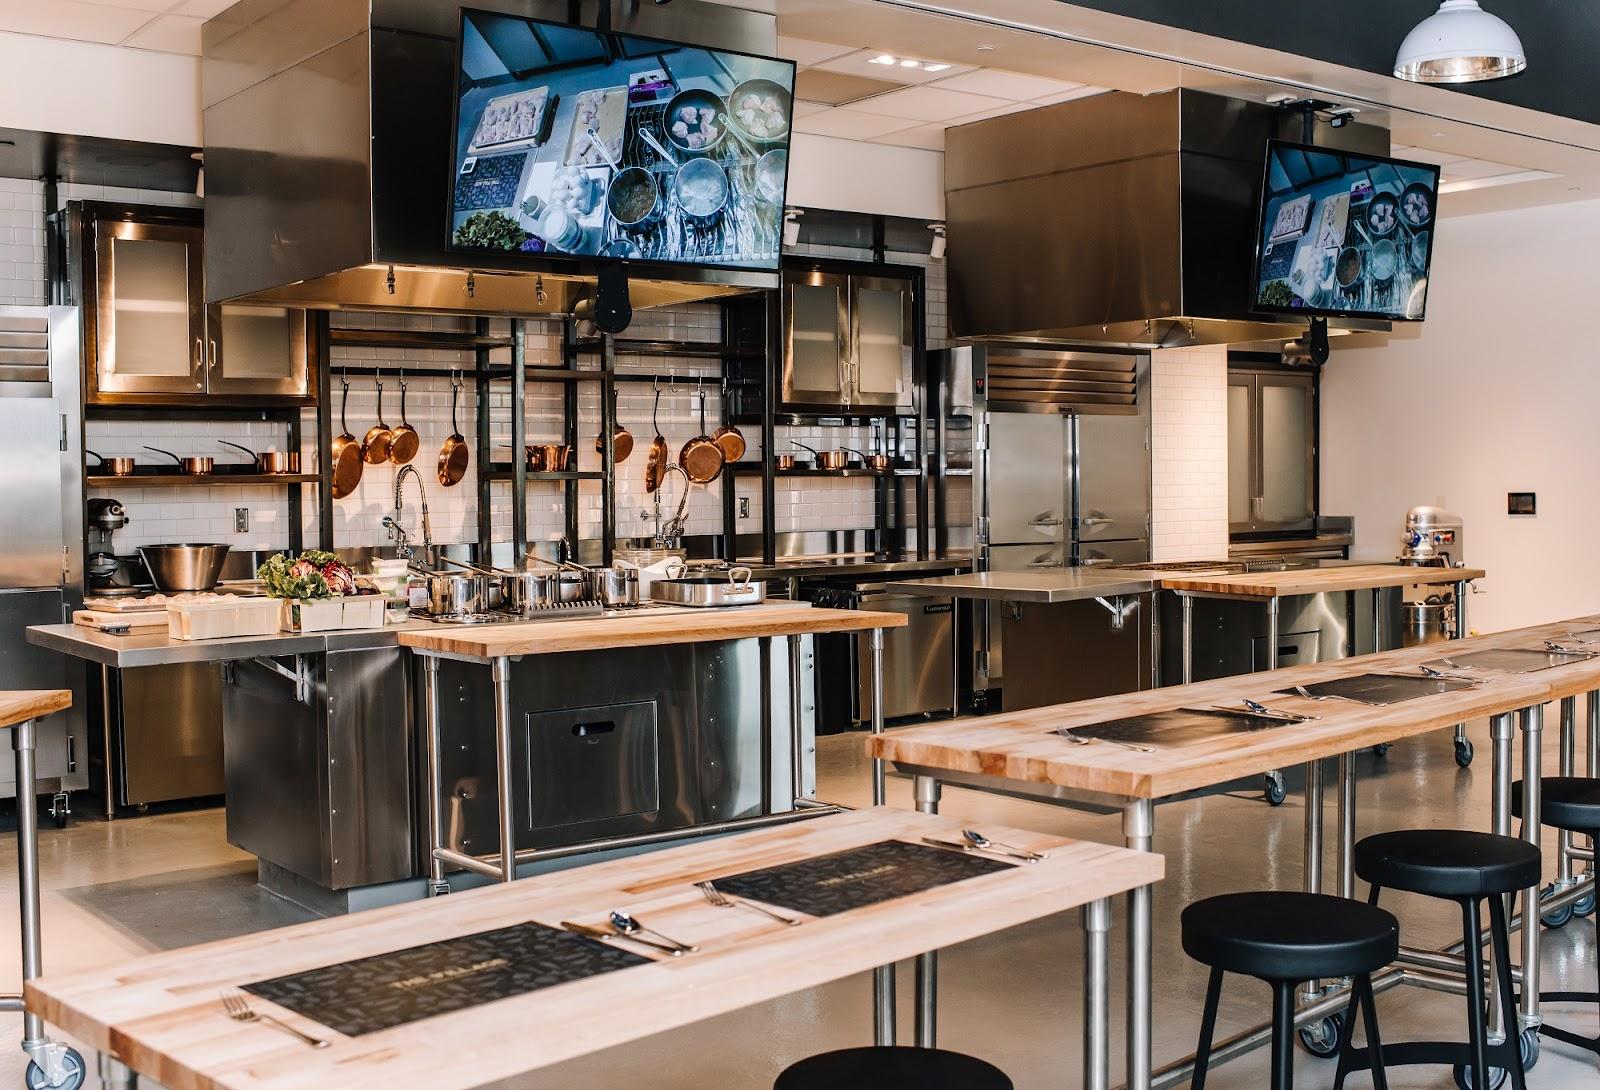 Demo Kitchen at the Meritage Resort